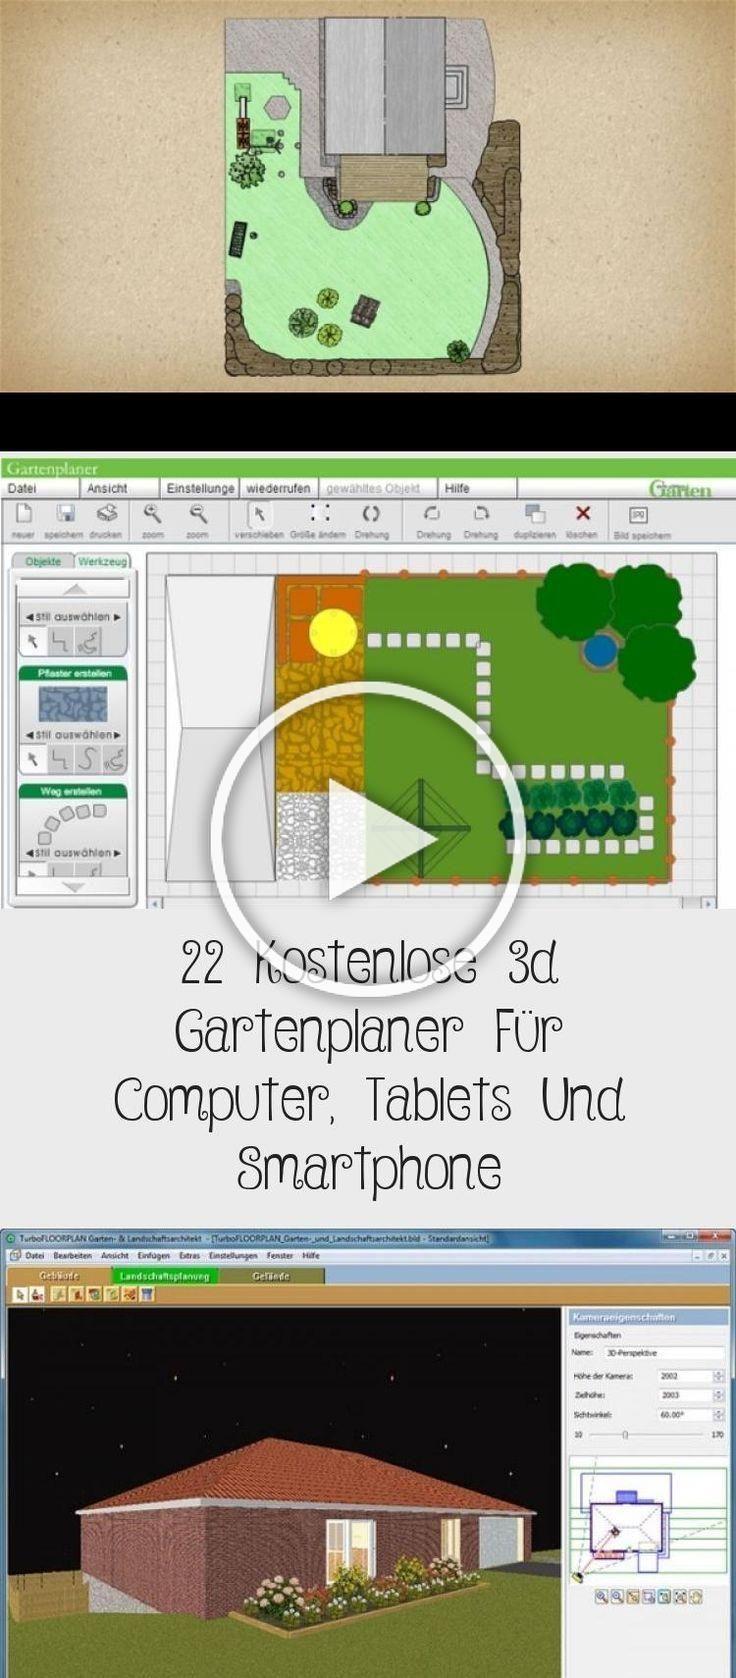 Gartenplanungideen Gartenplanungkinder Gartenplanunggestaltung Gartenplanungskizze Gartenplanunghang Planer Landschaftsbau Onlin In 2020 With Images Diy Decor Decor Diy